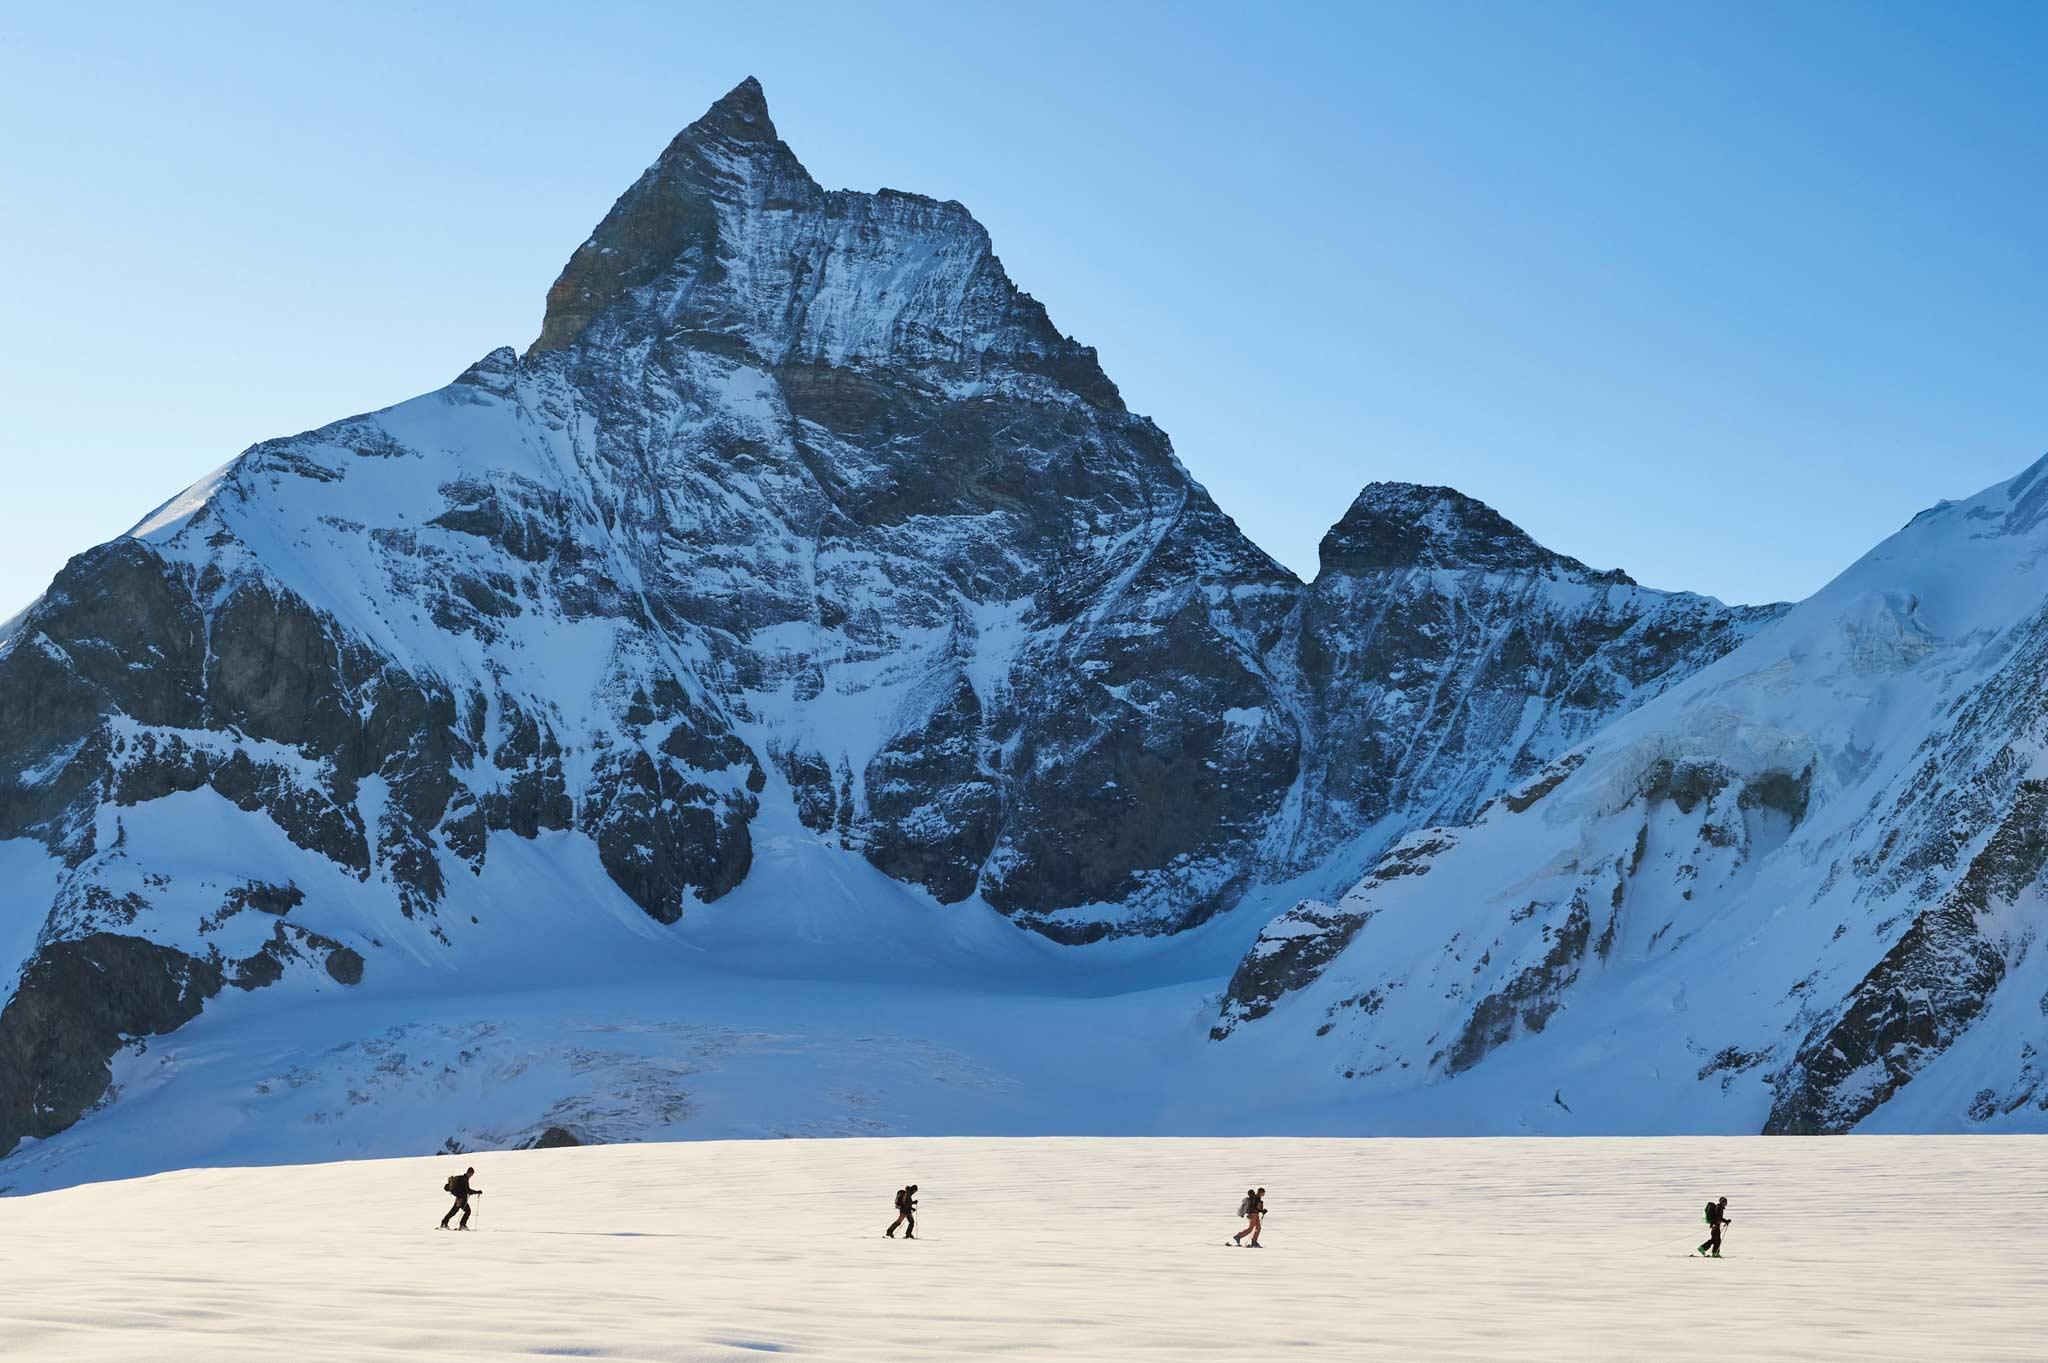 """Zermatt To Verbier"" Full Movie - 2020 - The Faction Collective - Foto: Rudi Flück"